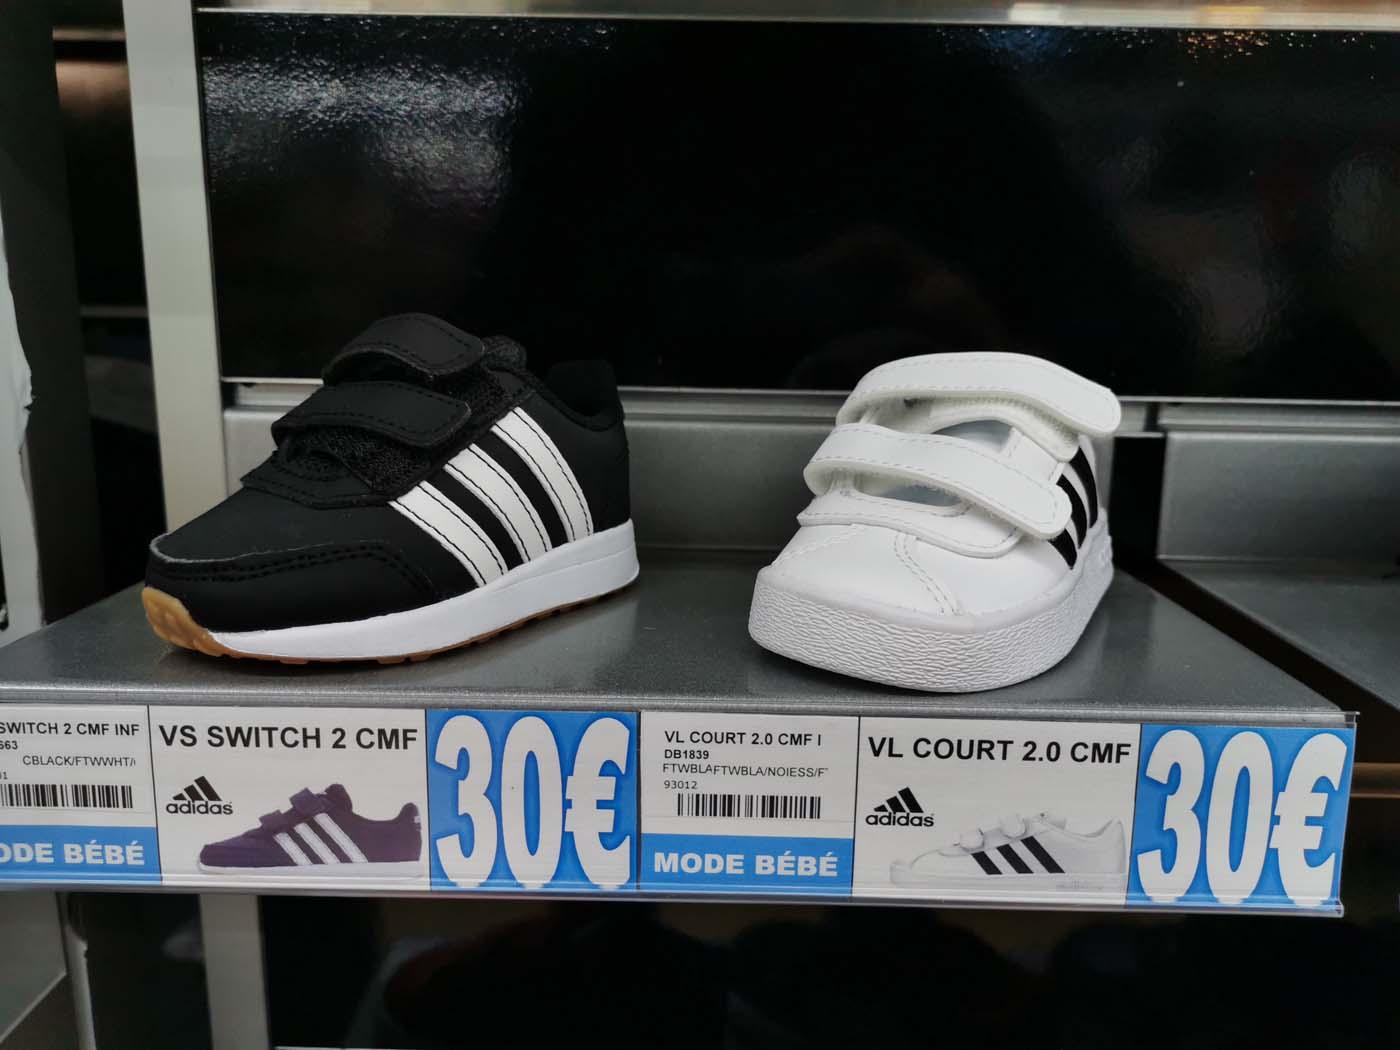 sneakers enfant vl court 2.0 adidas